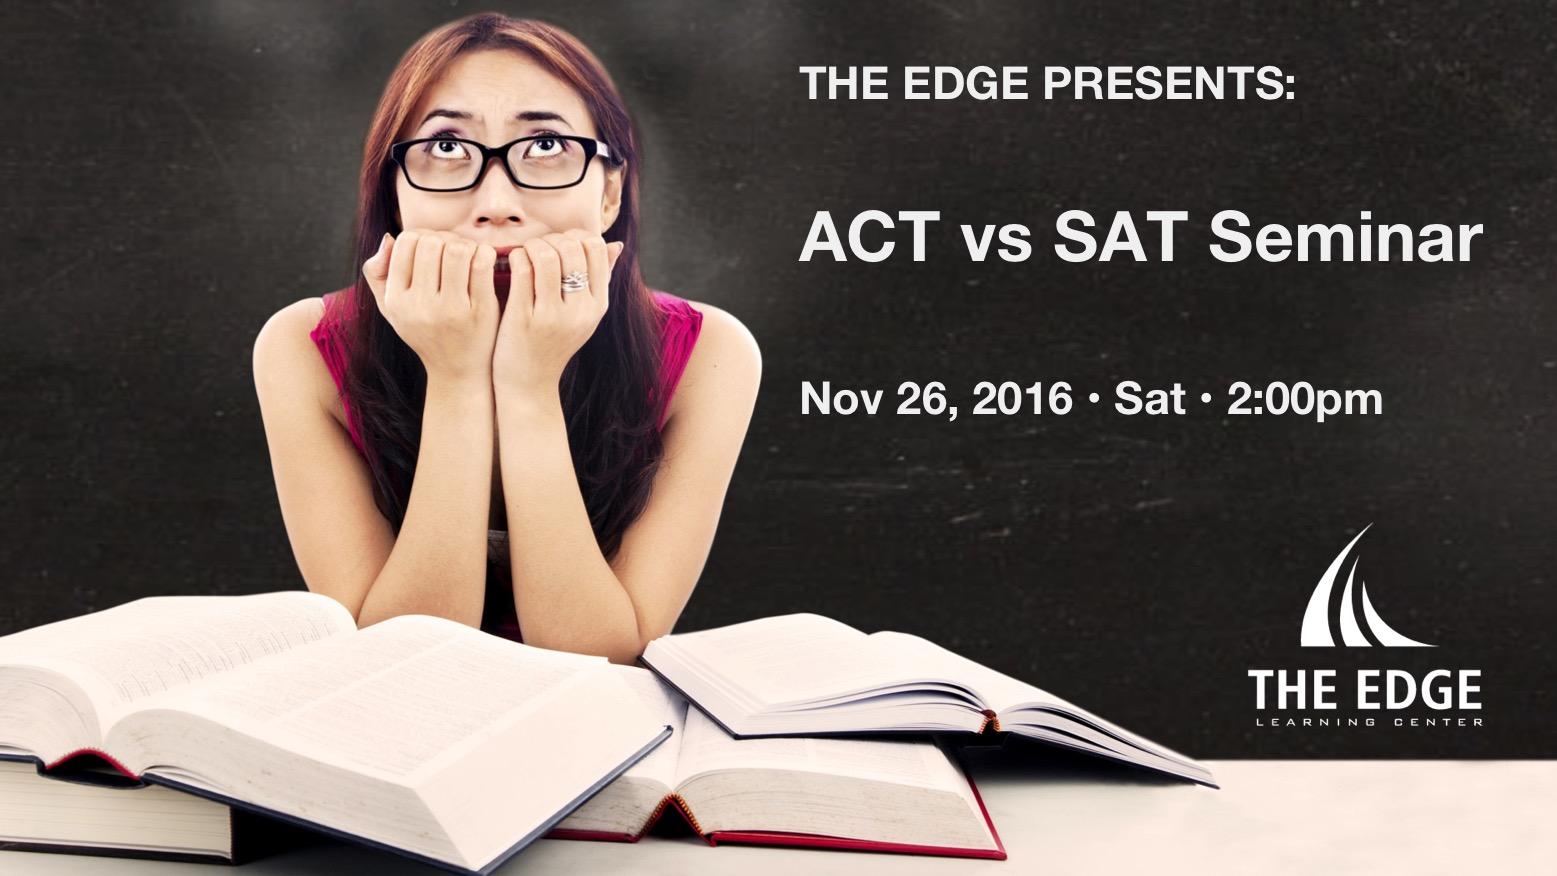 ACT vs SAT Seminar